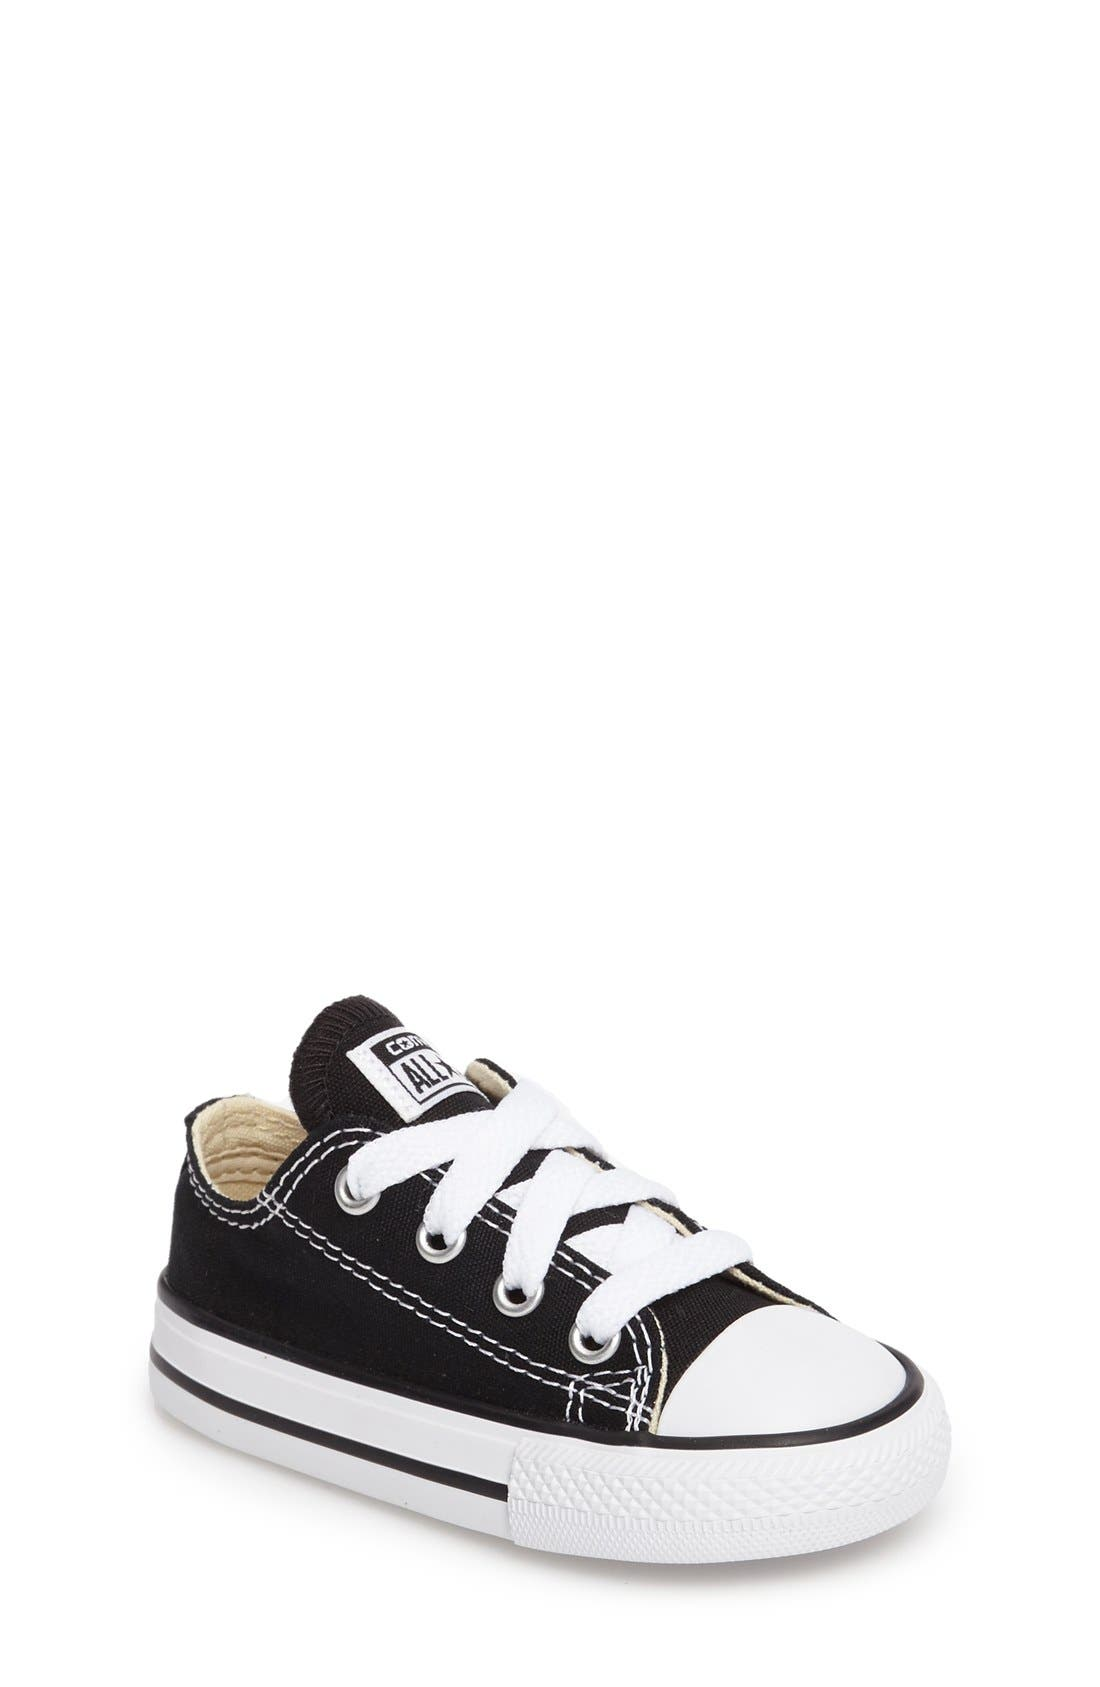 CONVERSE Chuck Taylor<sup>®</sup> Low Top Sneaker, Main, color, BLACK